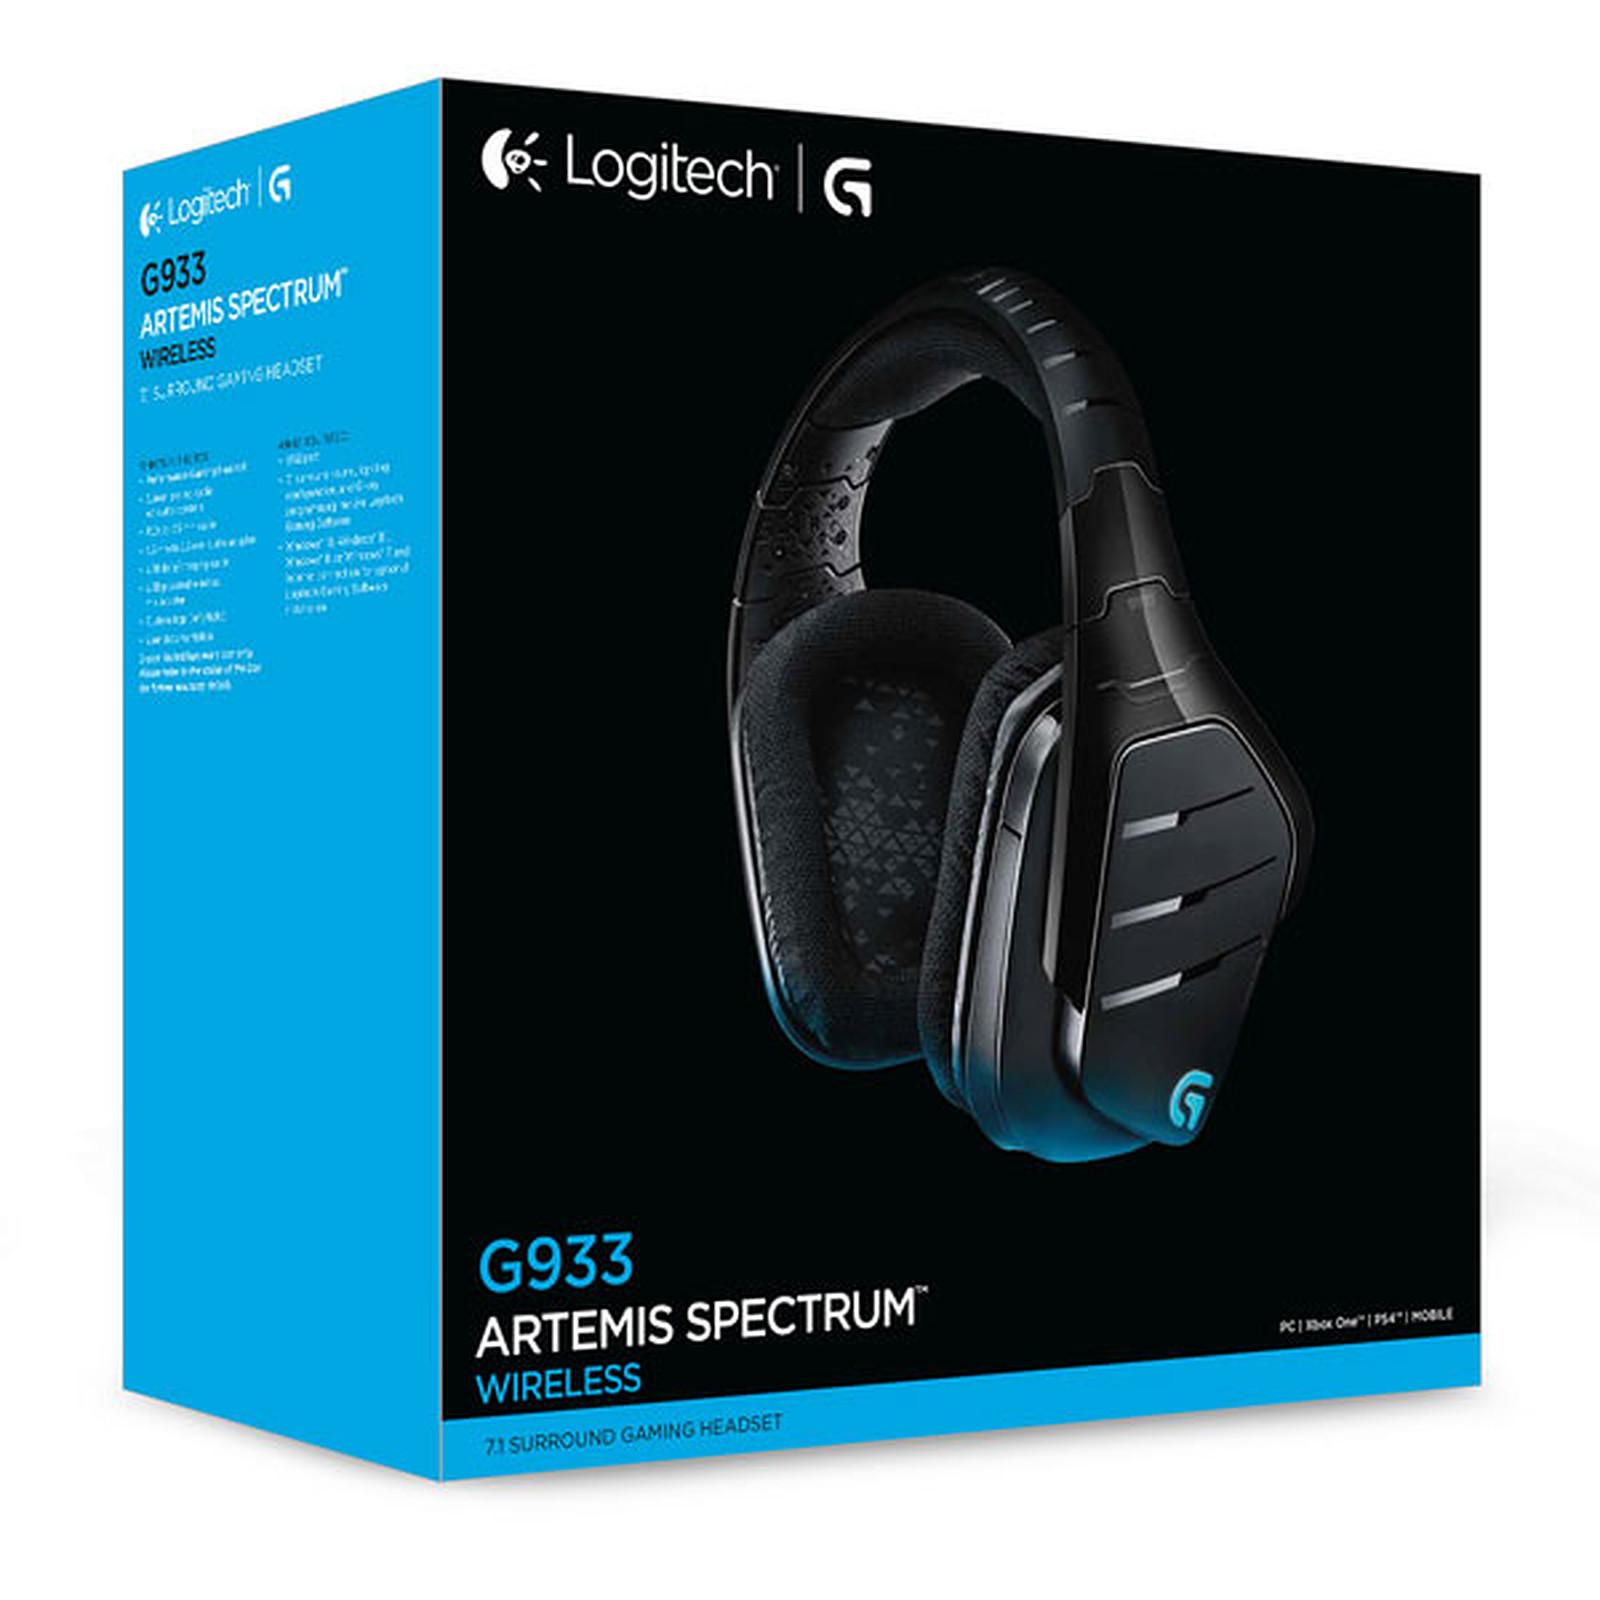 casque logitech g933 artemis spectrum wireless